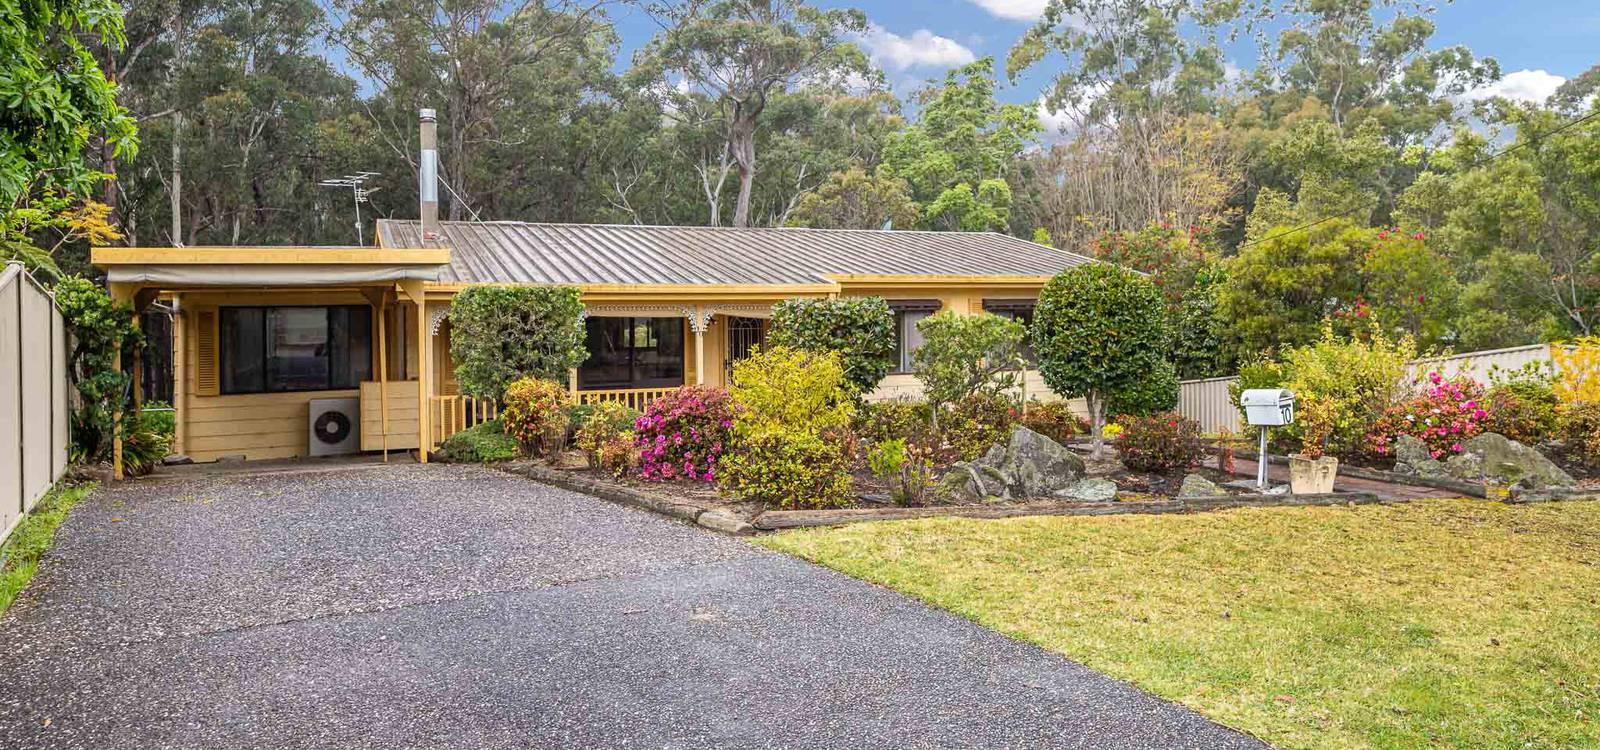 10 Northcove Road LONG BEACH, NSW 2536 - photo 1